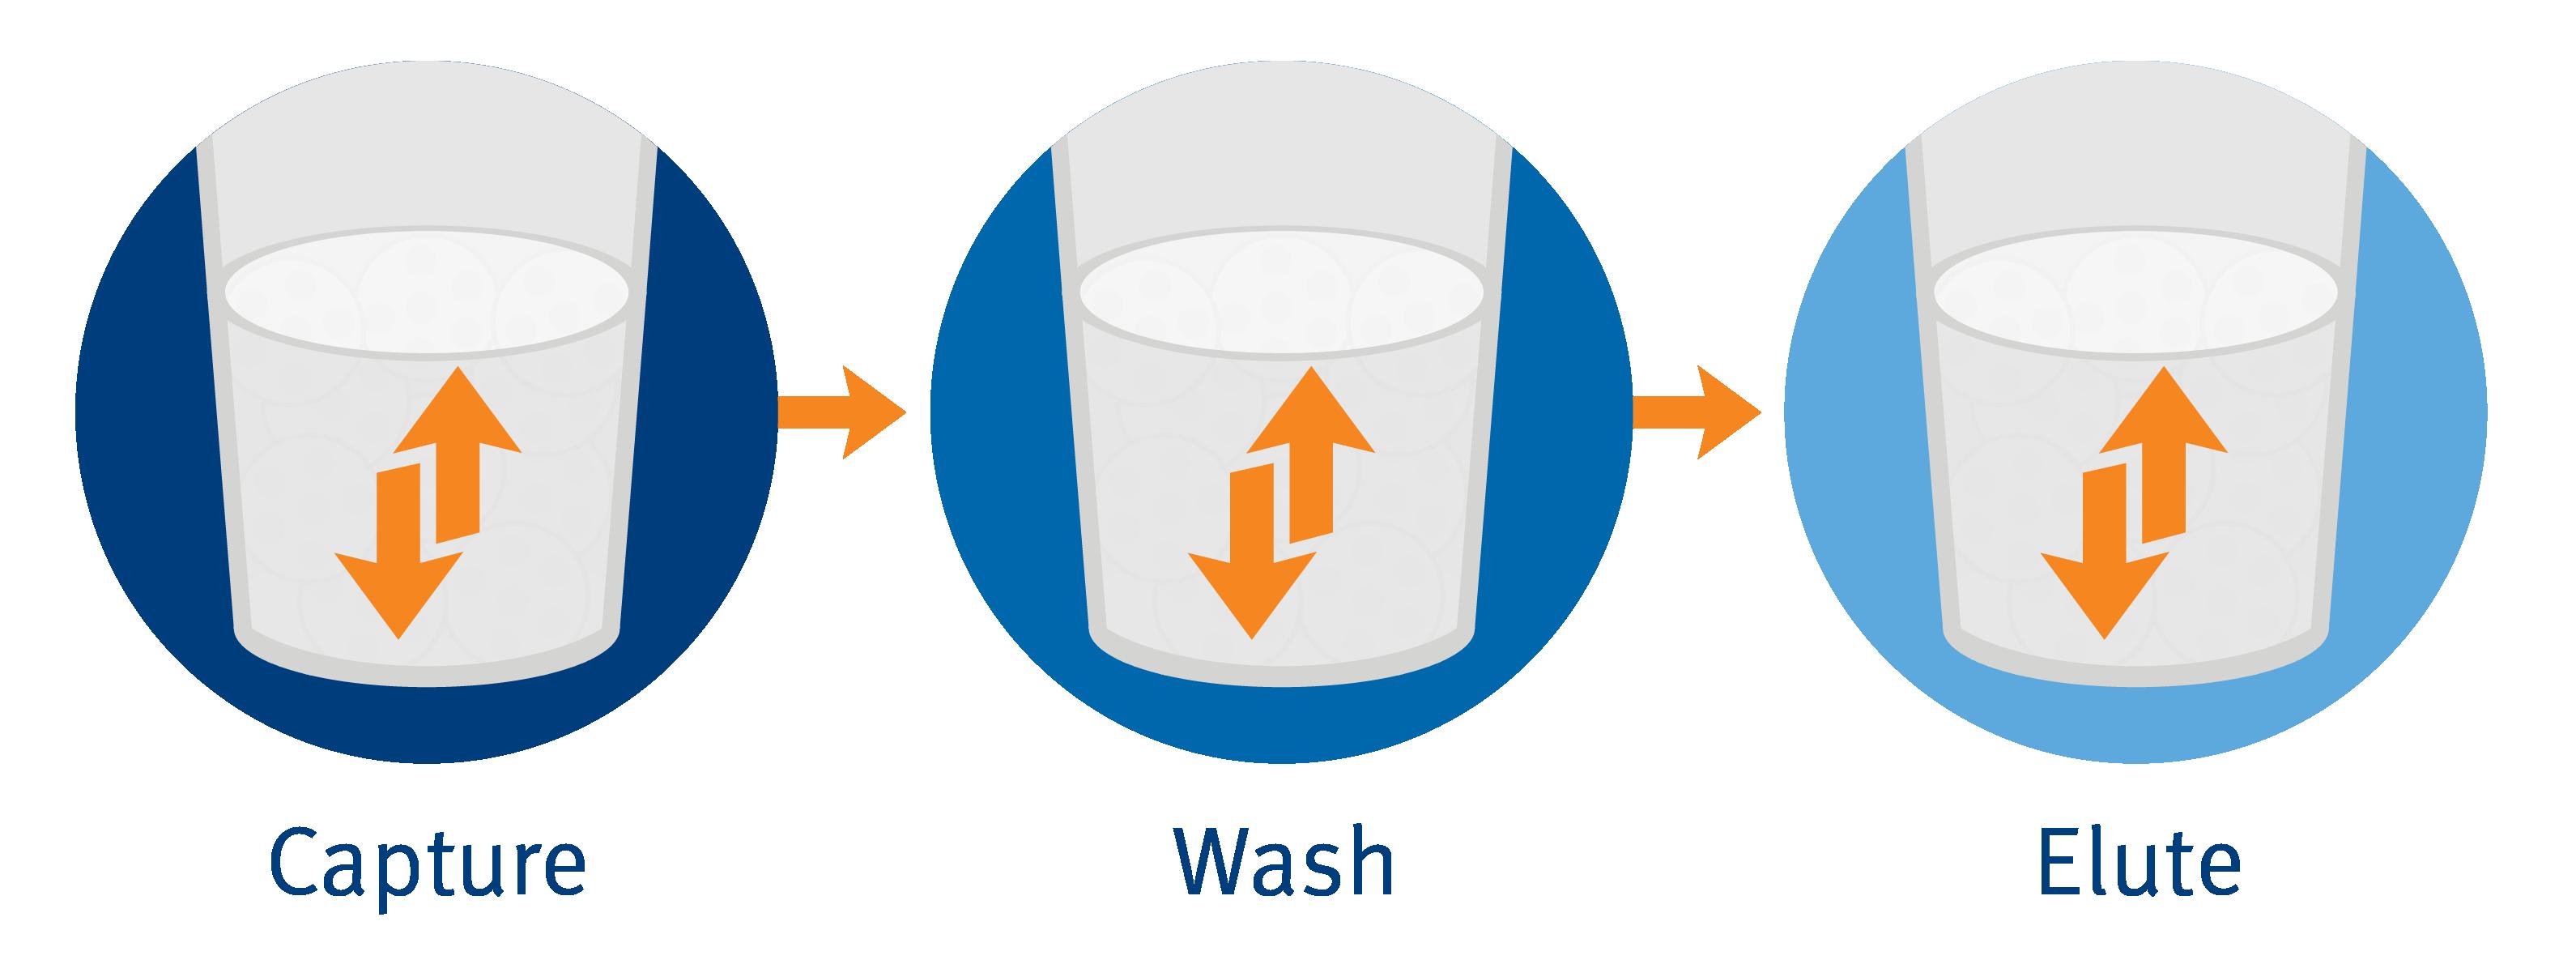 biomark002.441 - Capture Wash Elute